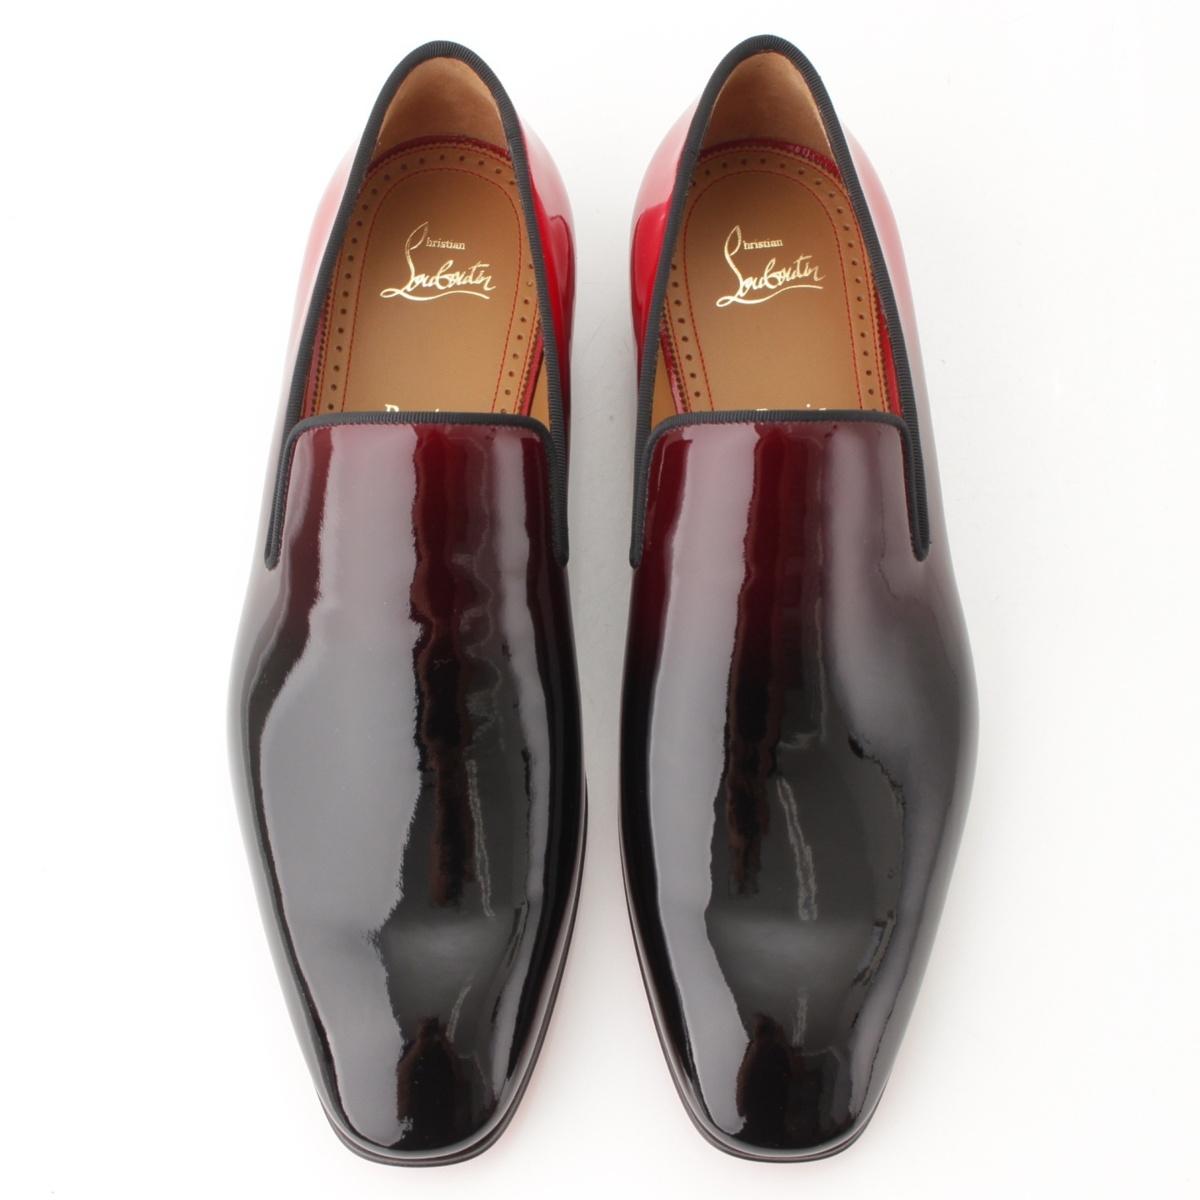 finest selection 57960 5ddd1 Christian Louboutin act product Dandelion Flat men patent flattie black X  red 42-free 61658